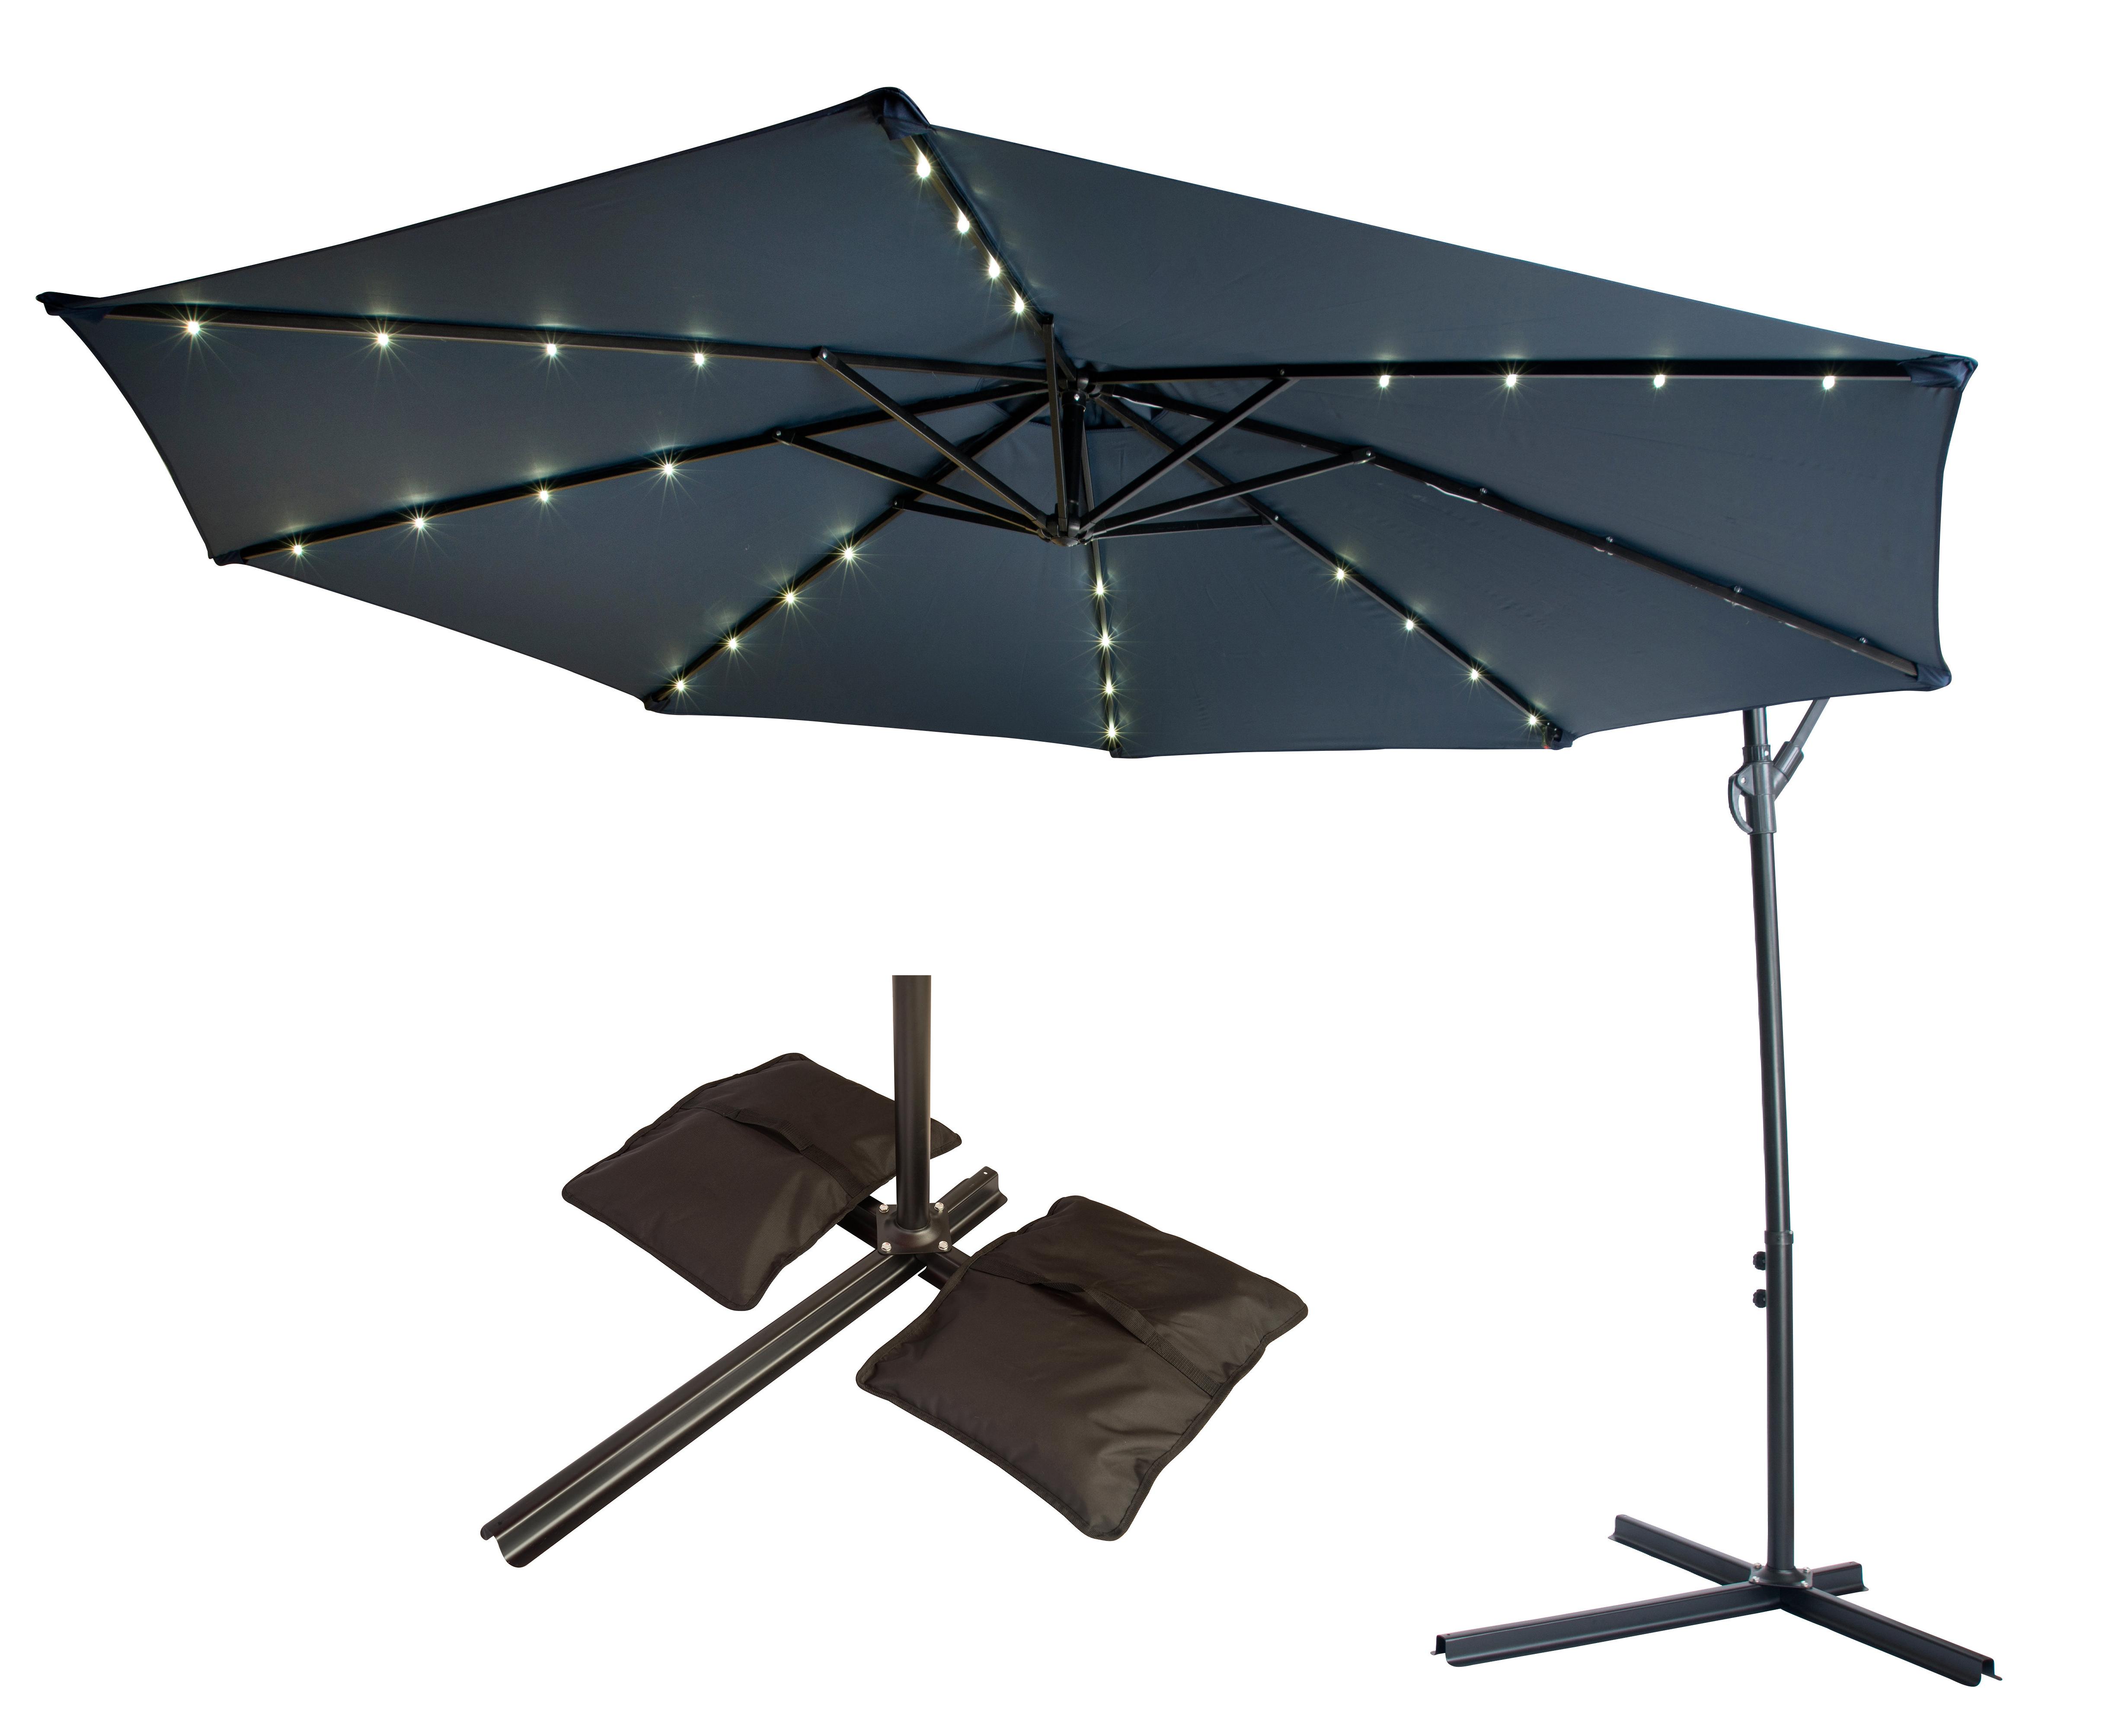 Preferred Kedzie Outdoor Cantilever Umbrellas With Regard To 10' Cantilever Umbrella (View 11 of 20)